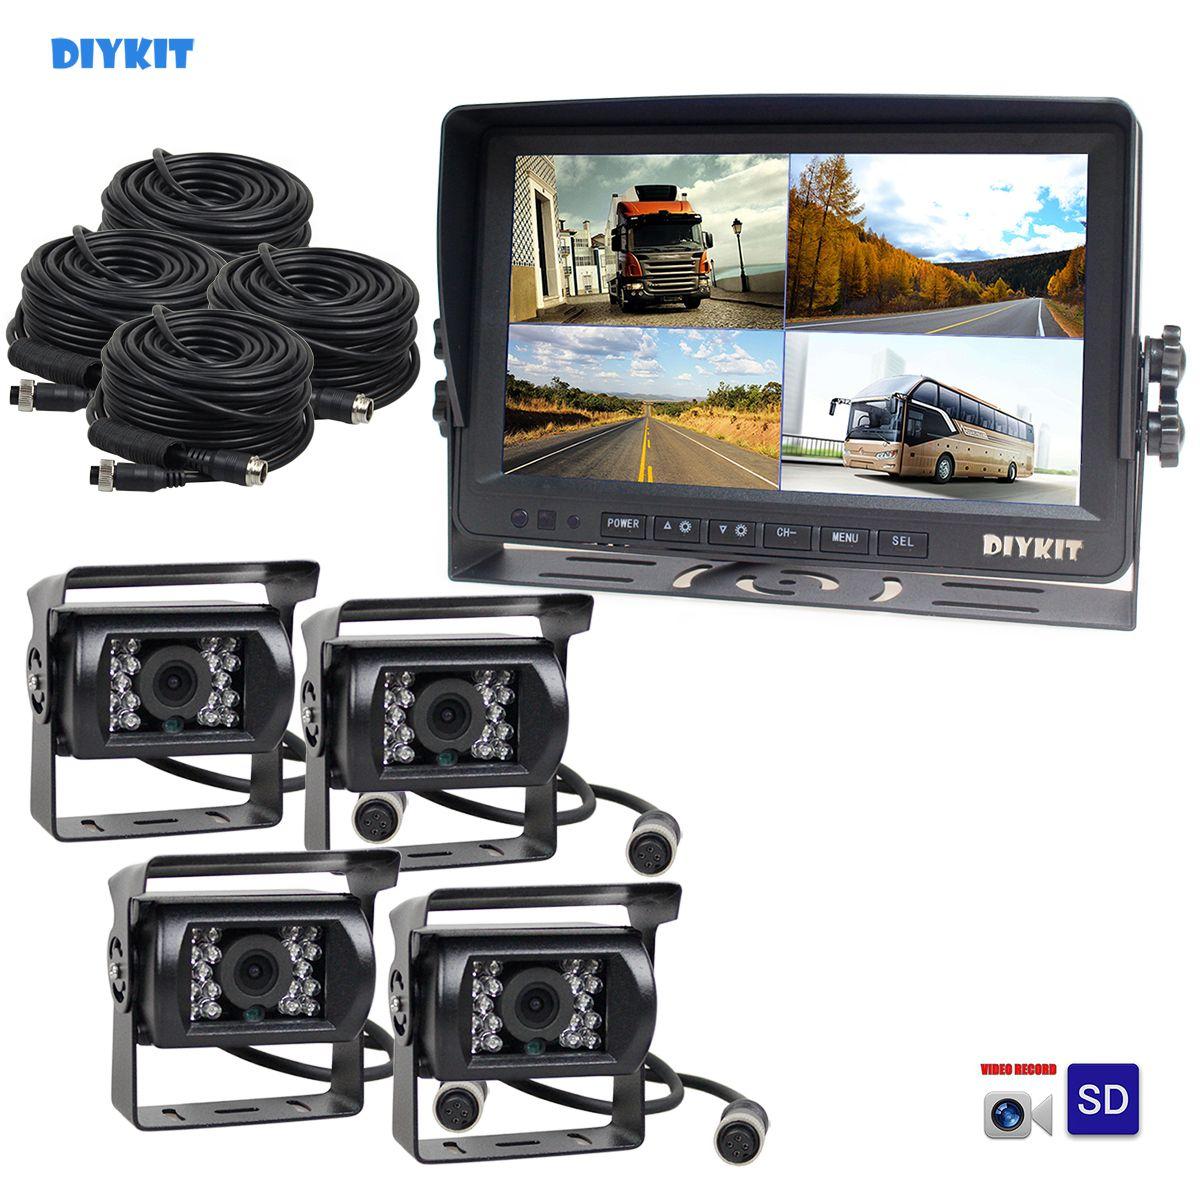 DIYKIT AHD 9Inch Split QUAD Car Monitor 960P AHD IR Night Vision Rear View Camera Waterproof with SD Card Video Recording